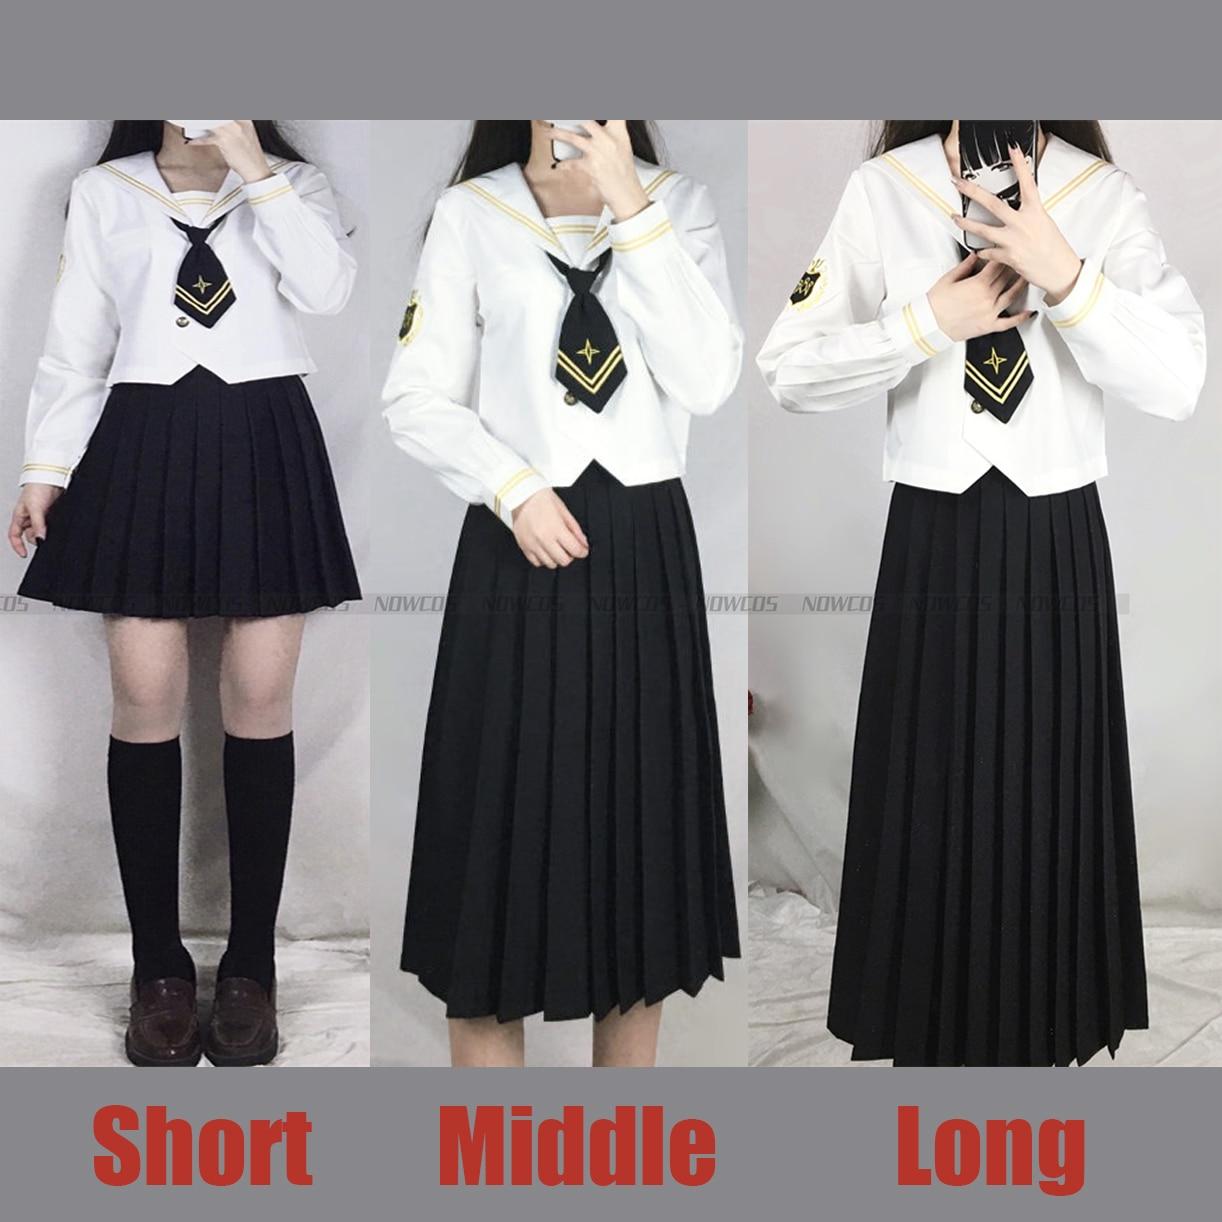 Women JK Uniform Orthodox Sailor Suit Embroidery Badge Genuine Japanese Student Girls Class School Uniform Set in Spring Autumn